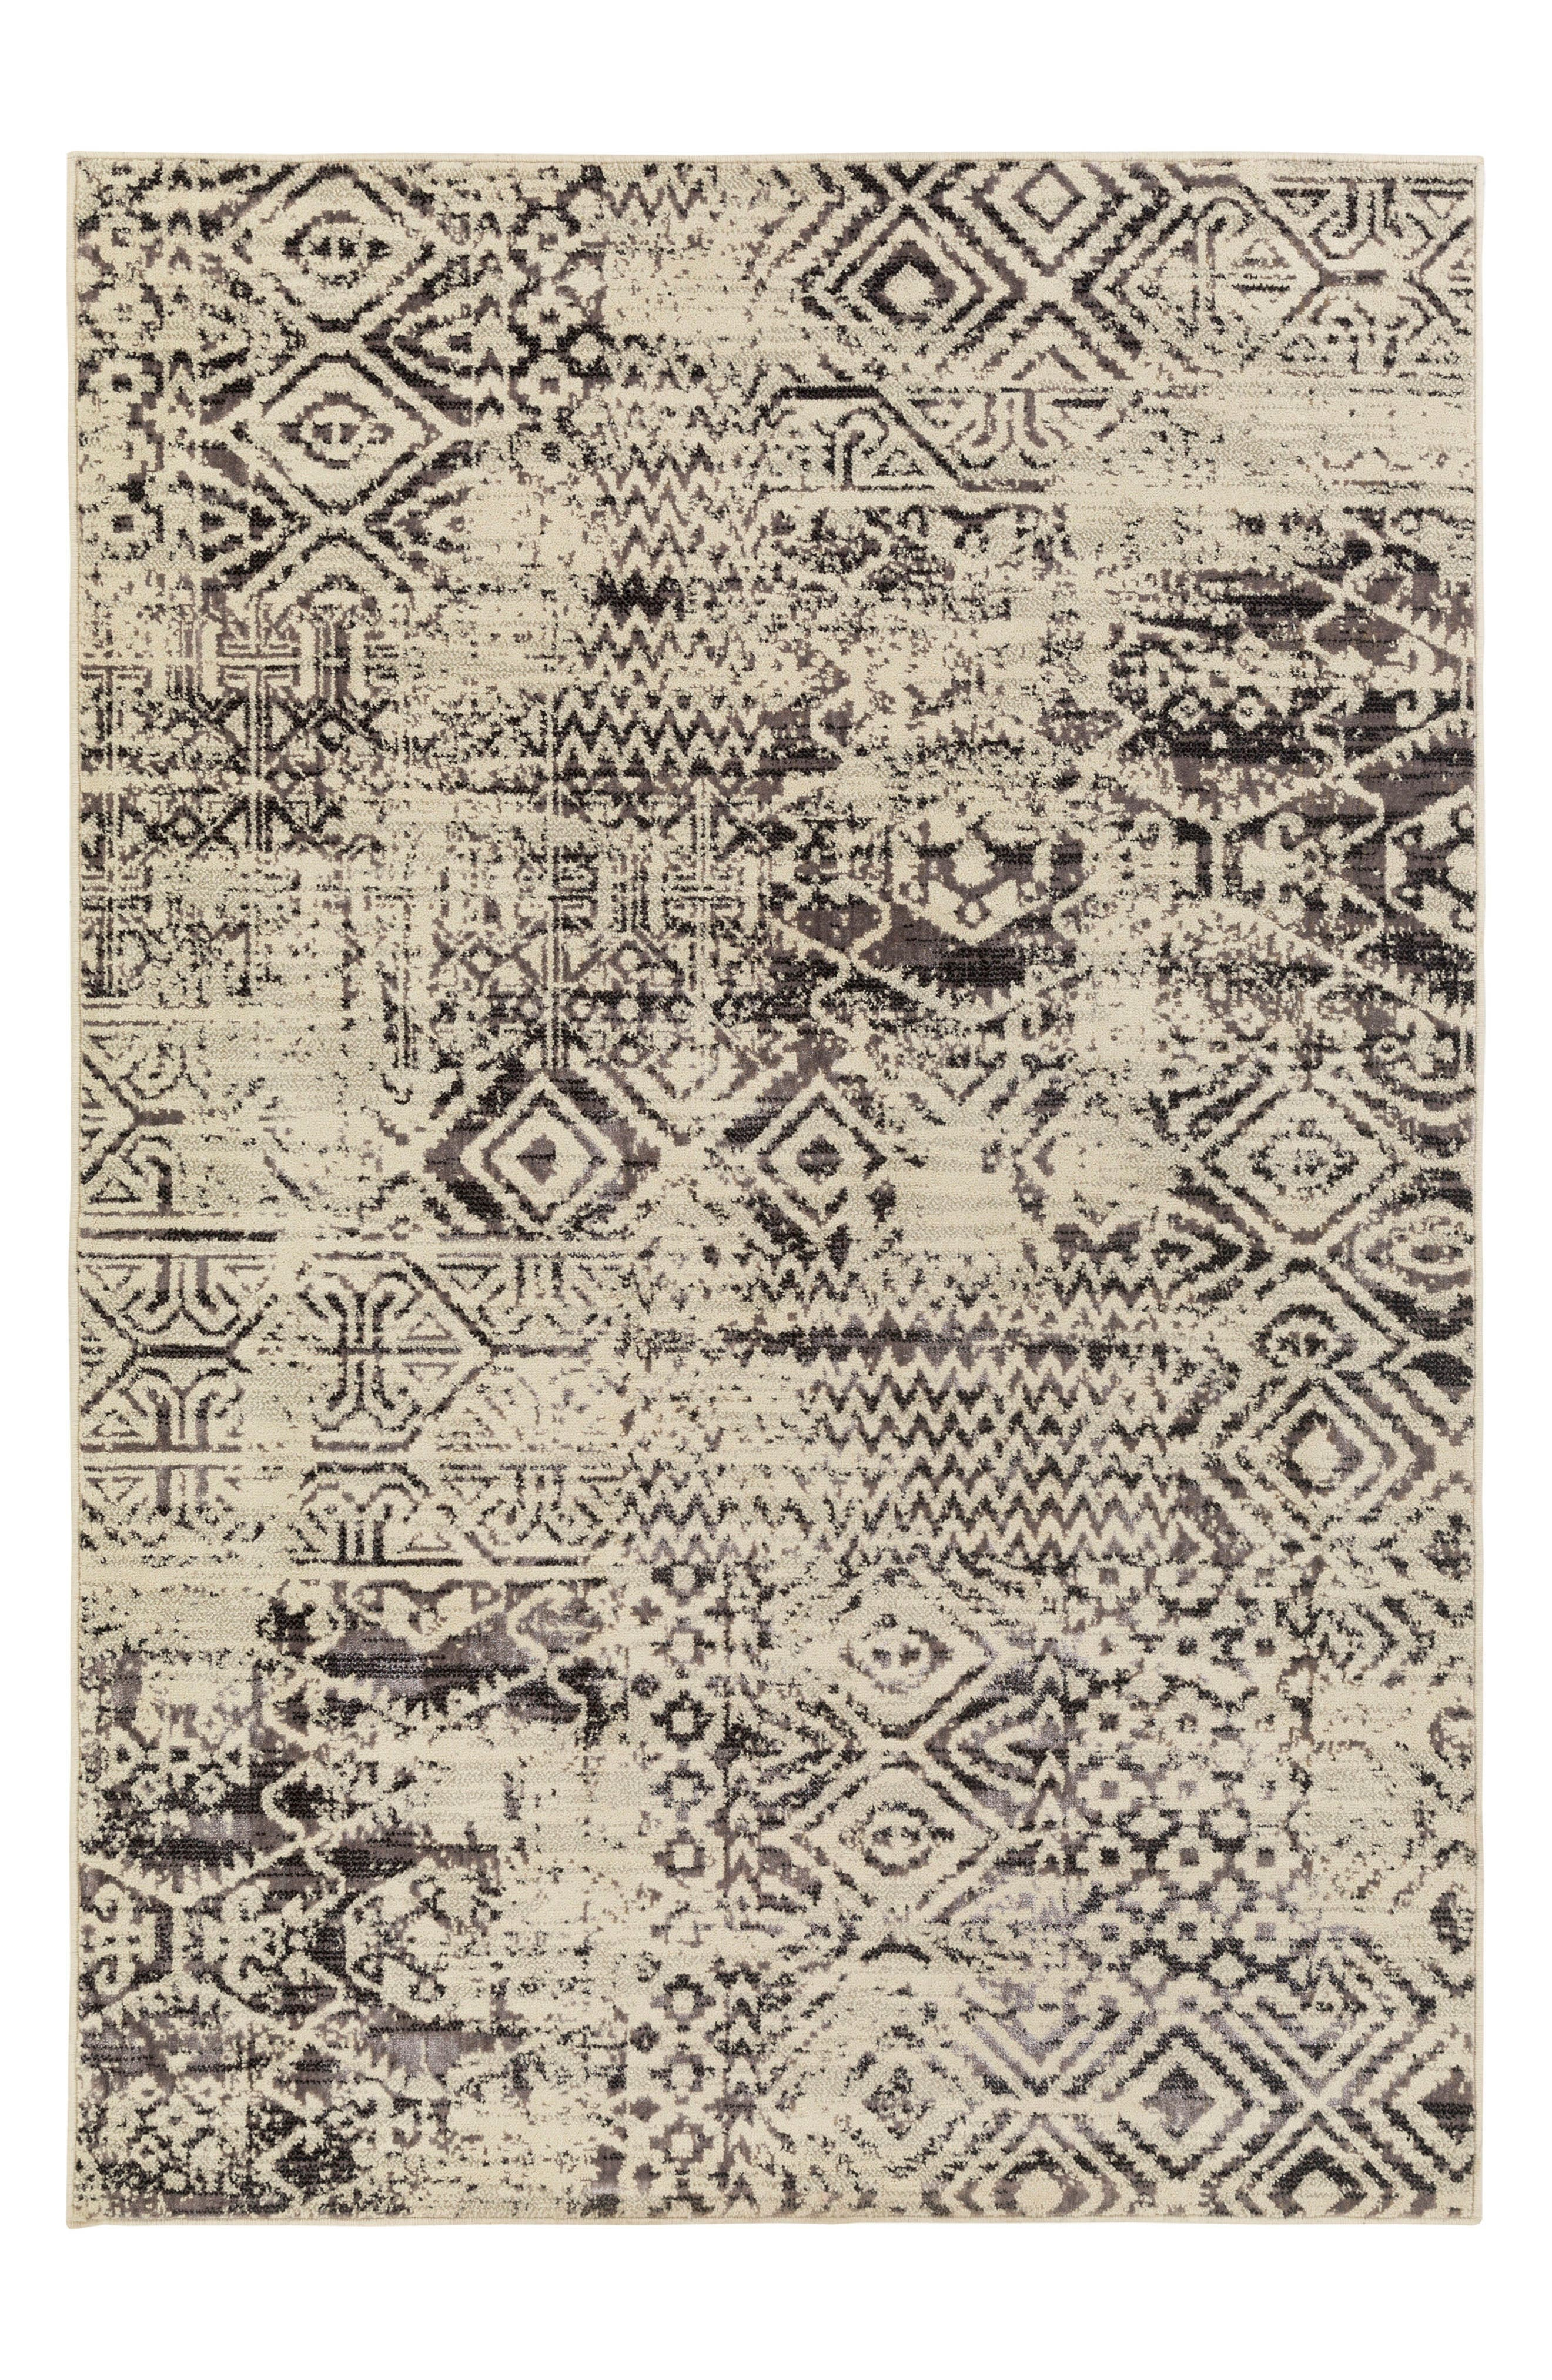 Stretto Global Maze Rug,                         Main,                         color,